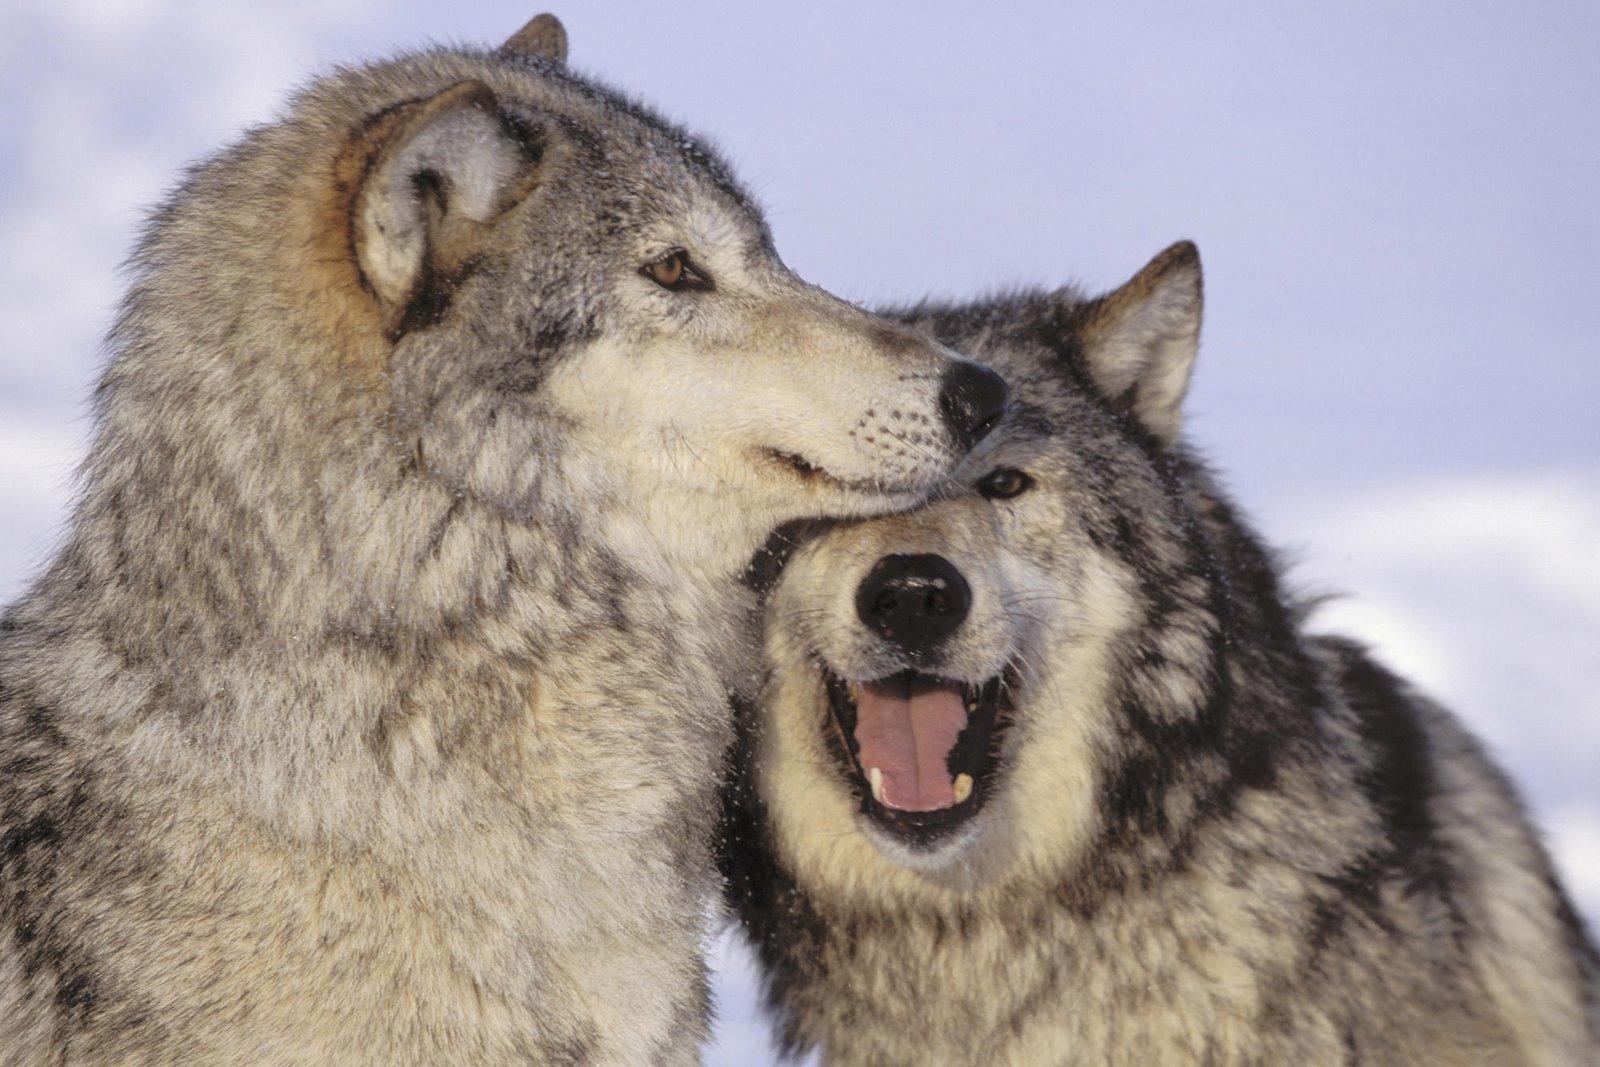 Cute Husky Wallpaper Hd Save The Alaskan Wolves Images Alaskan Wolves Playing